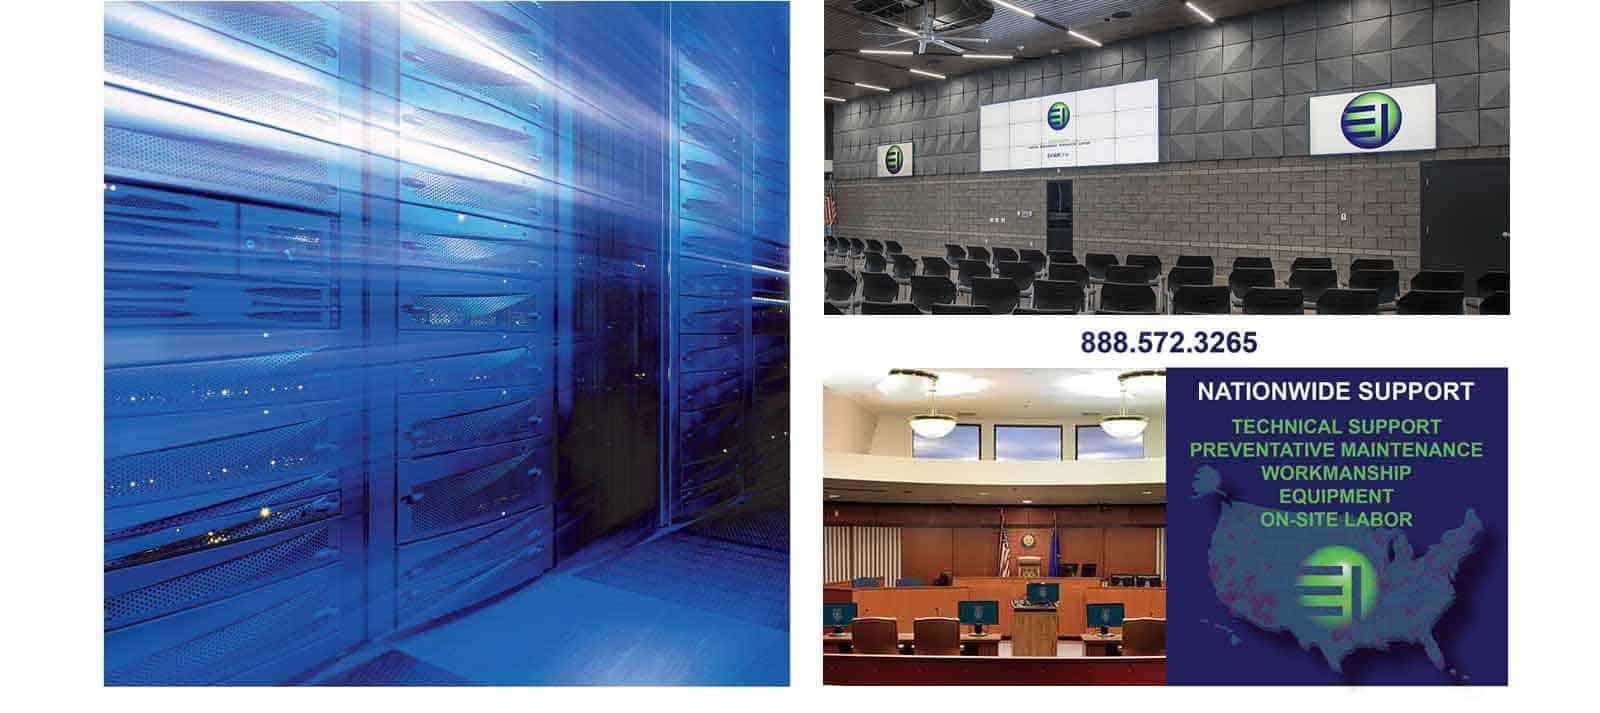 ExhibitOne Audiovisual Technologies